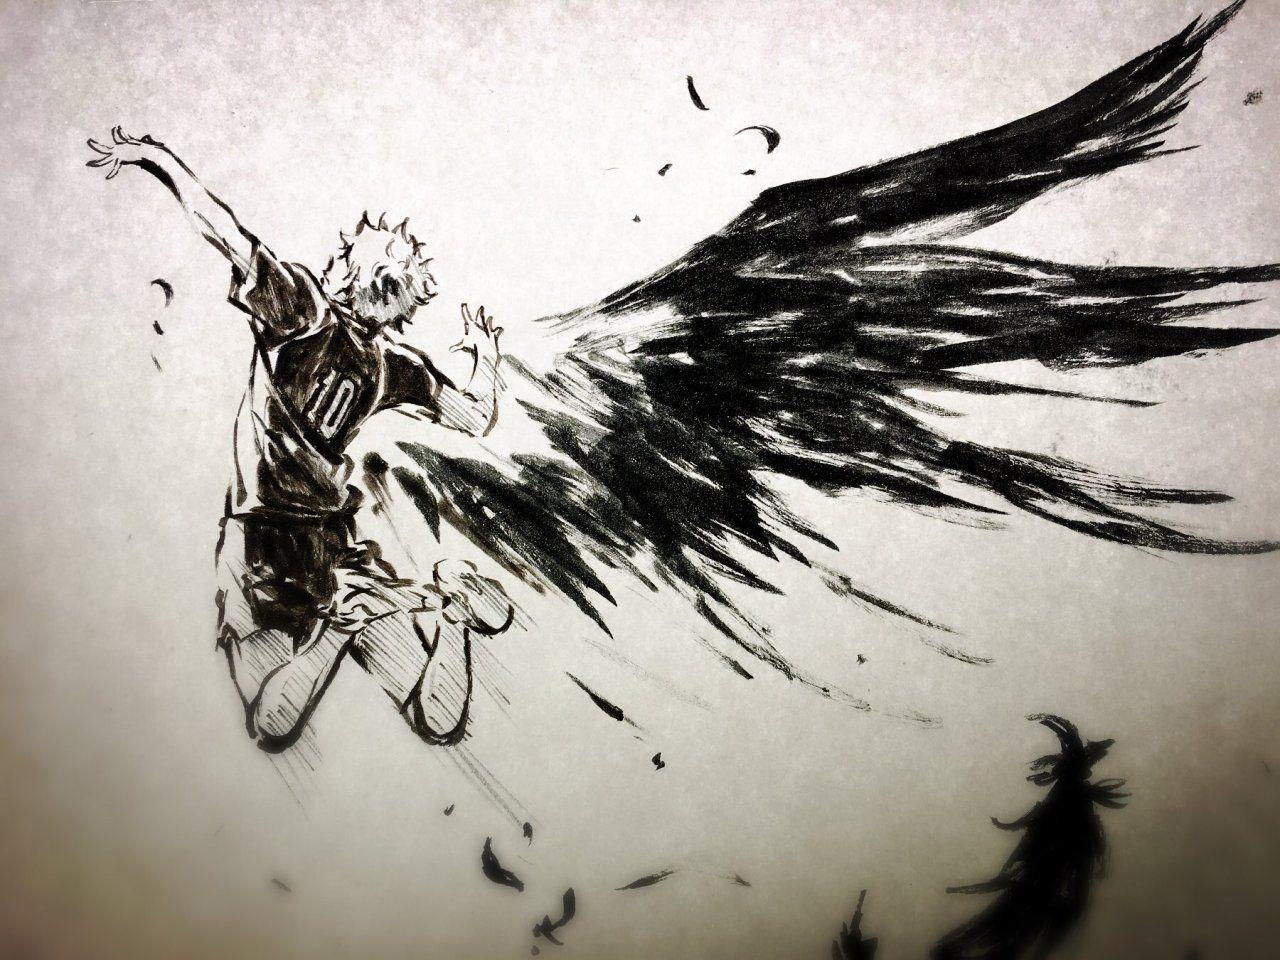 The Ink Task Haikyuu Anime Haikyuu Haikyuu Wallpaper